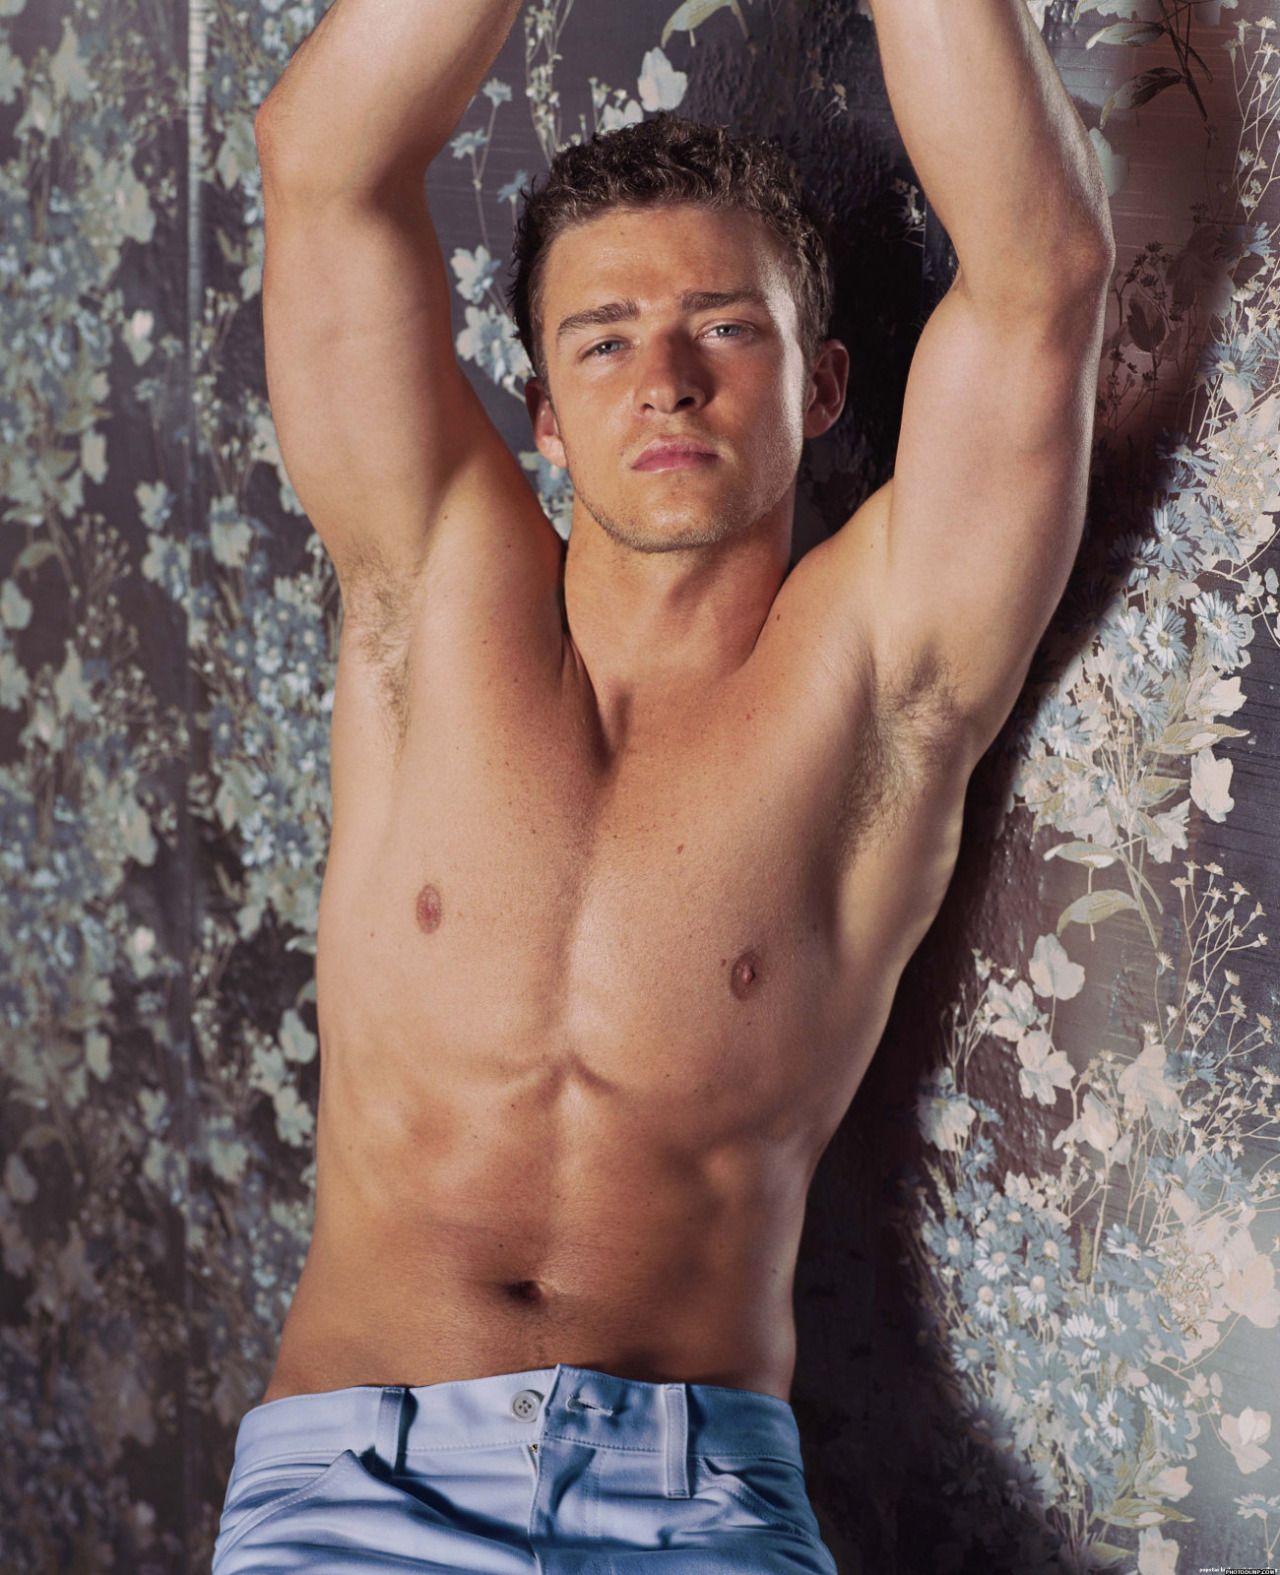 Justin Timberlake photo 11 of 626 pics, wallpaper - photo